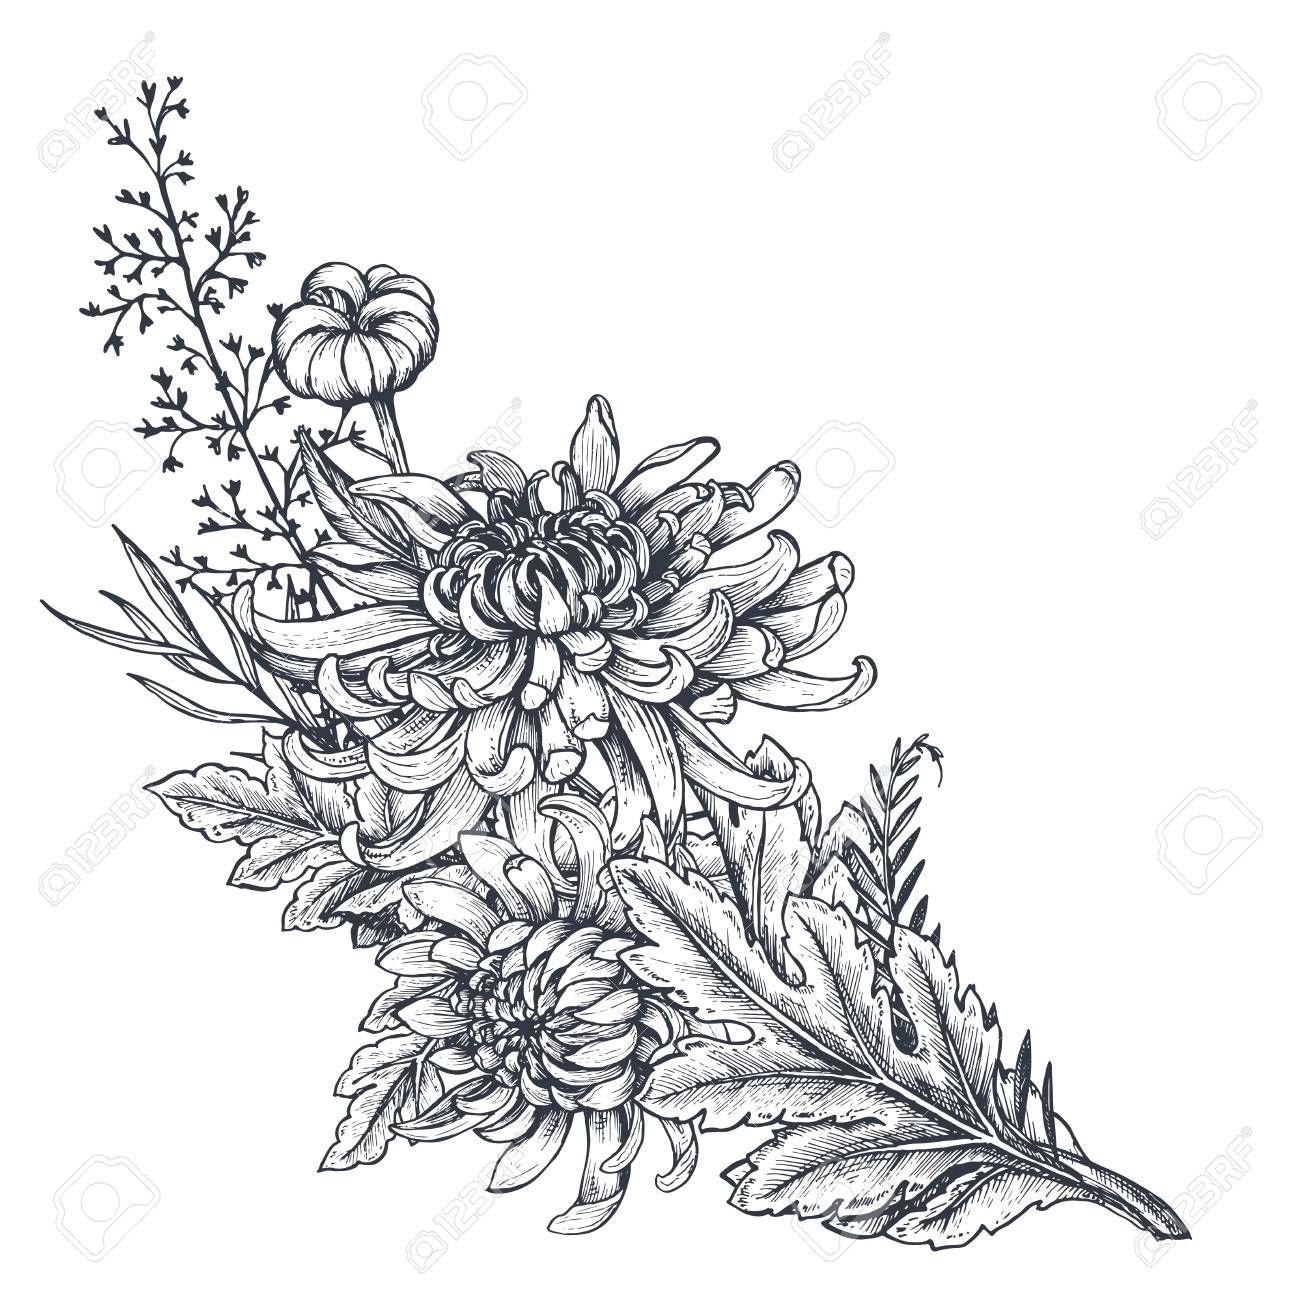 Vector Bouquet Of Hand Drawn Chrysanthemum Flowers In 2020 Chrysanthemum Flower Drawing Chrysanthemum Flower Chrysanthemum Flower Tattoo